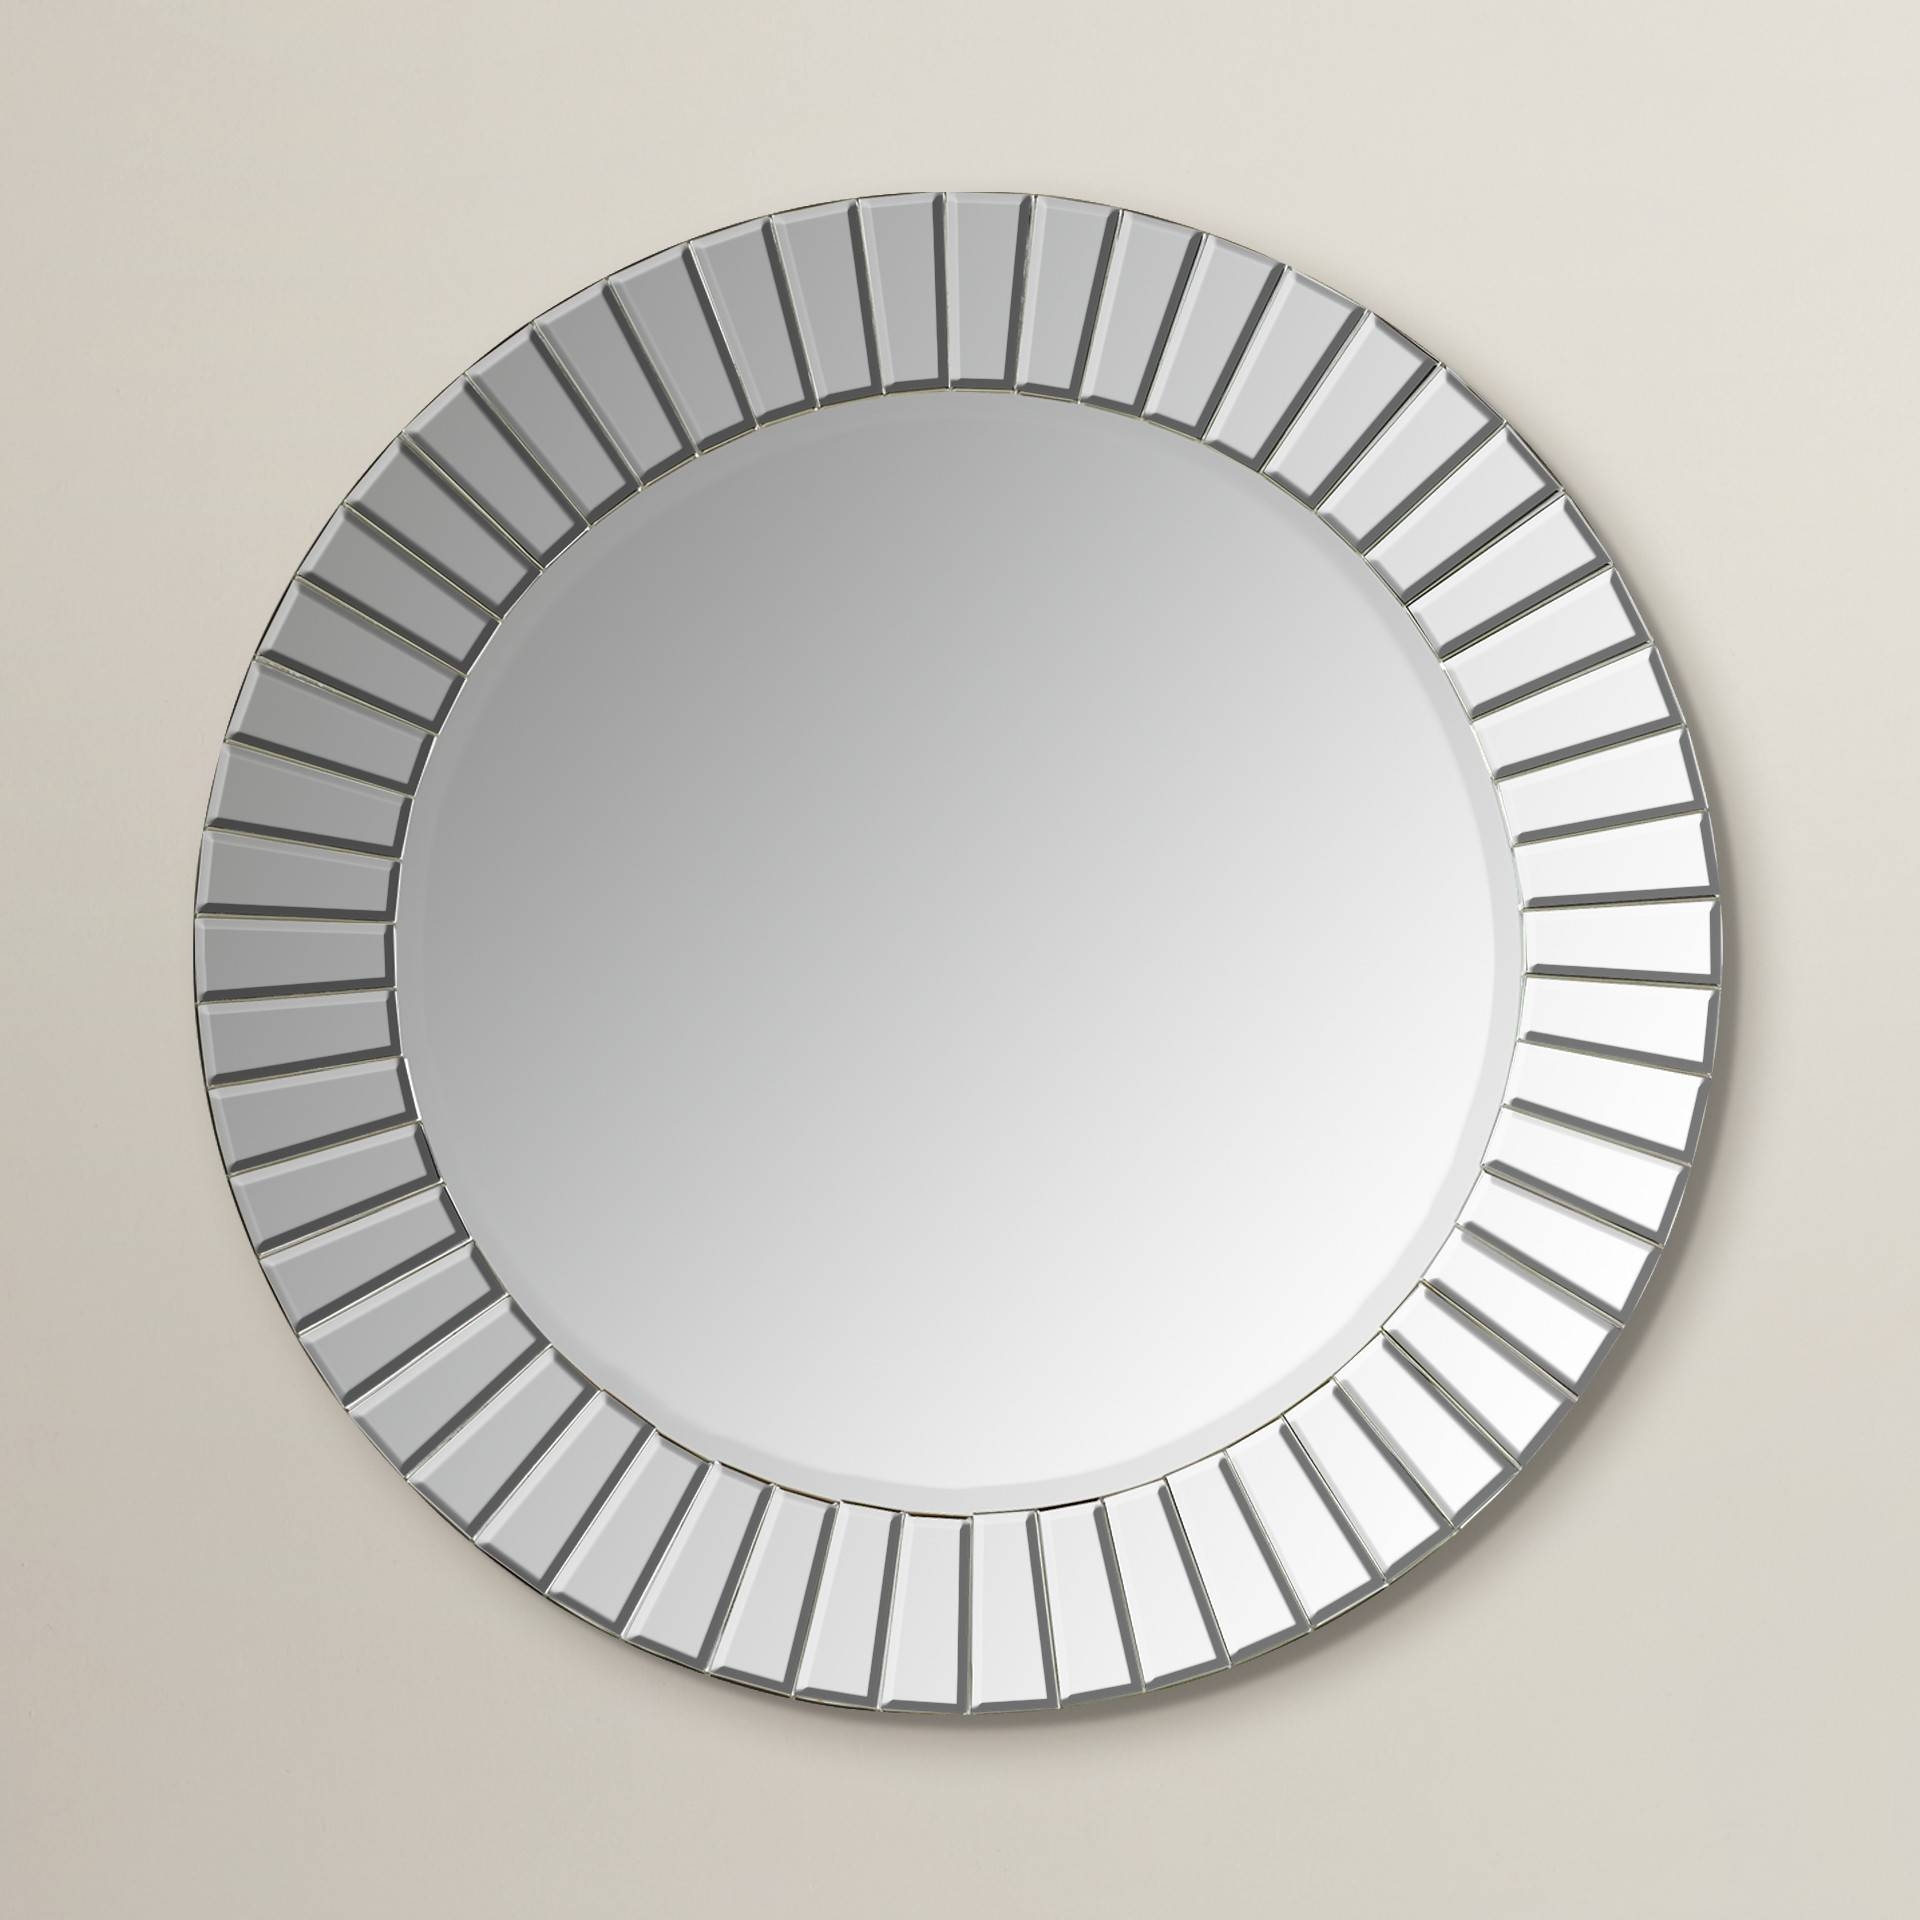 Bathroom: Light Up Your Home With Frameless Beveled Mirror inside Vintage Frameless Mirrors (Image 4 of 15)